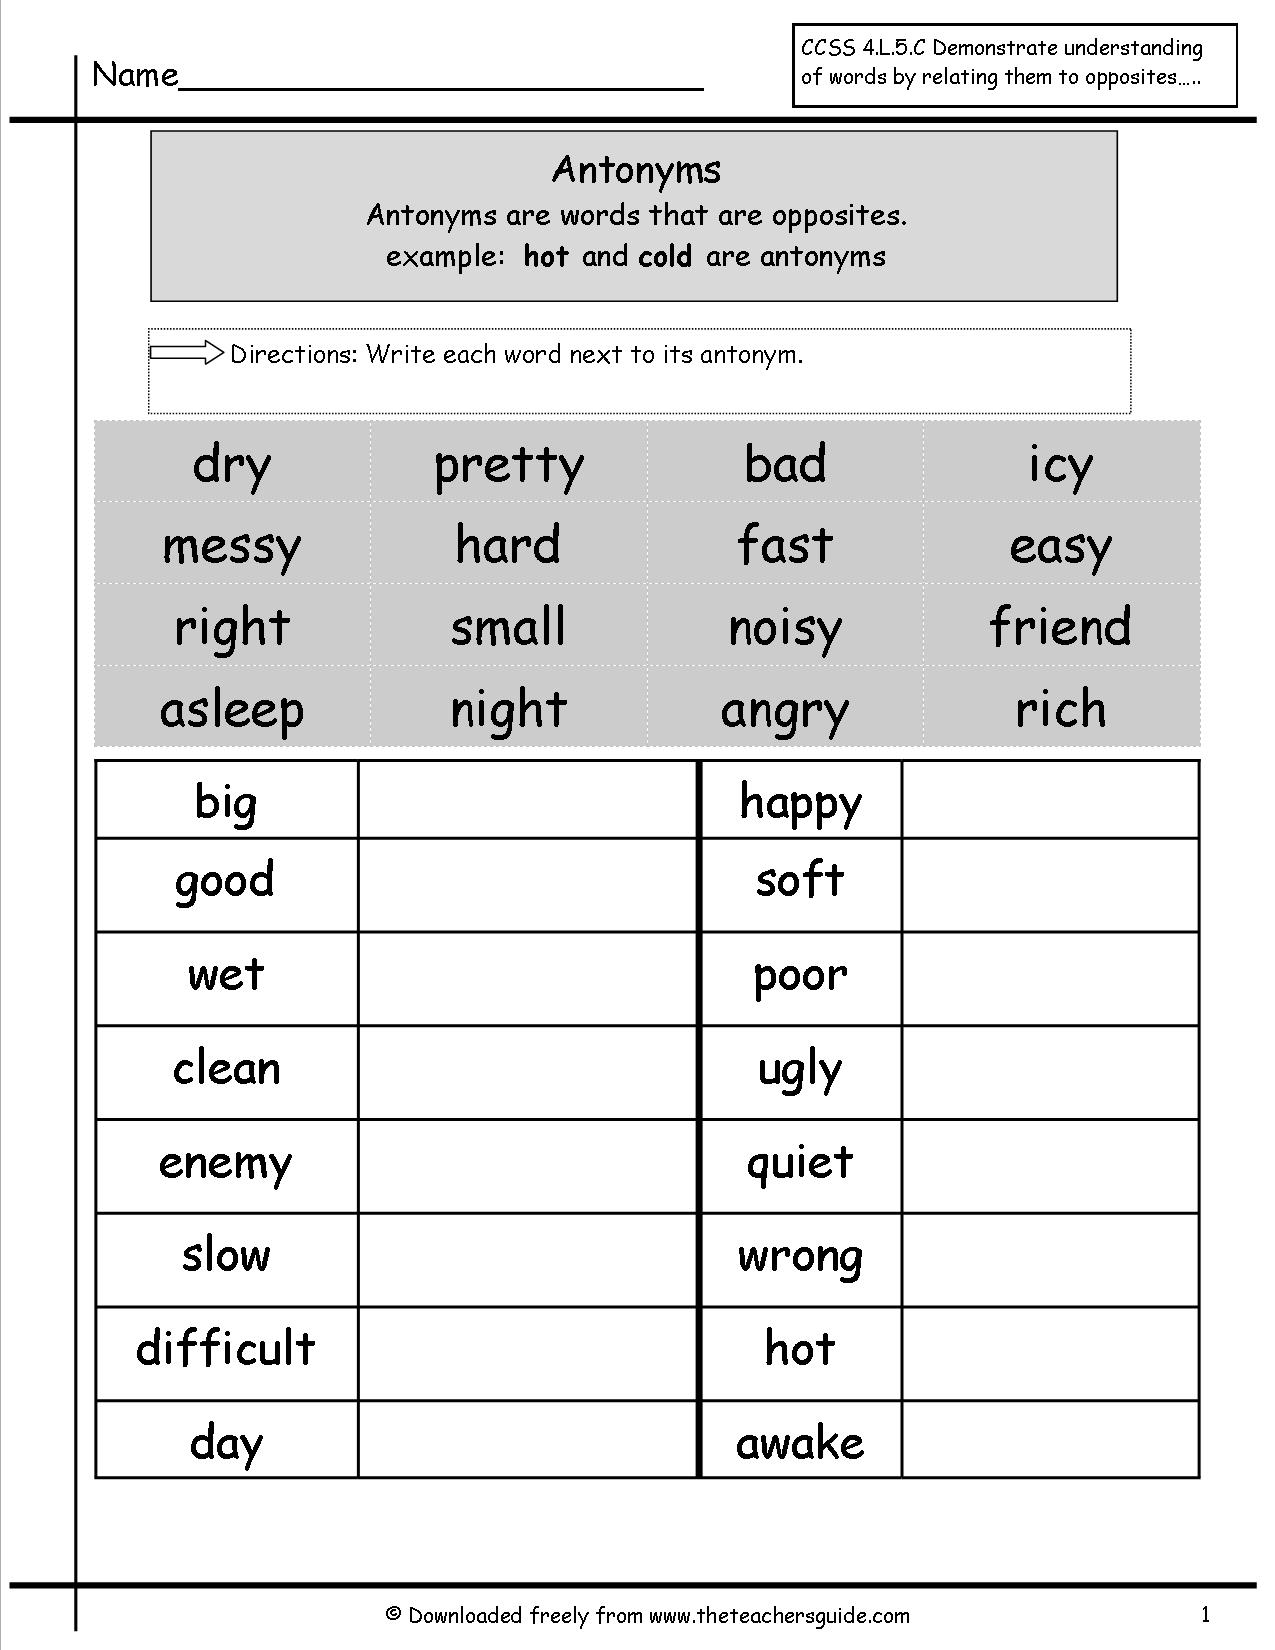 14 Best Images Of English Grammar Worksheets